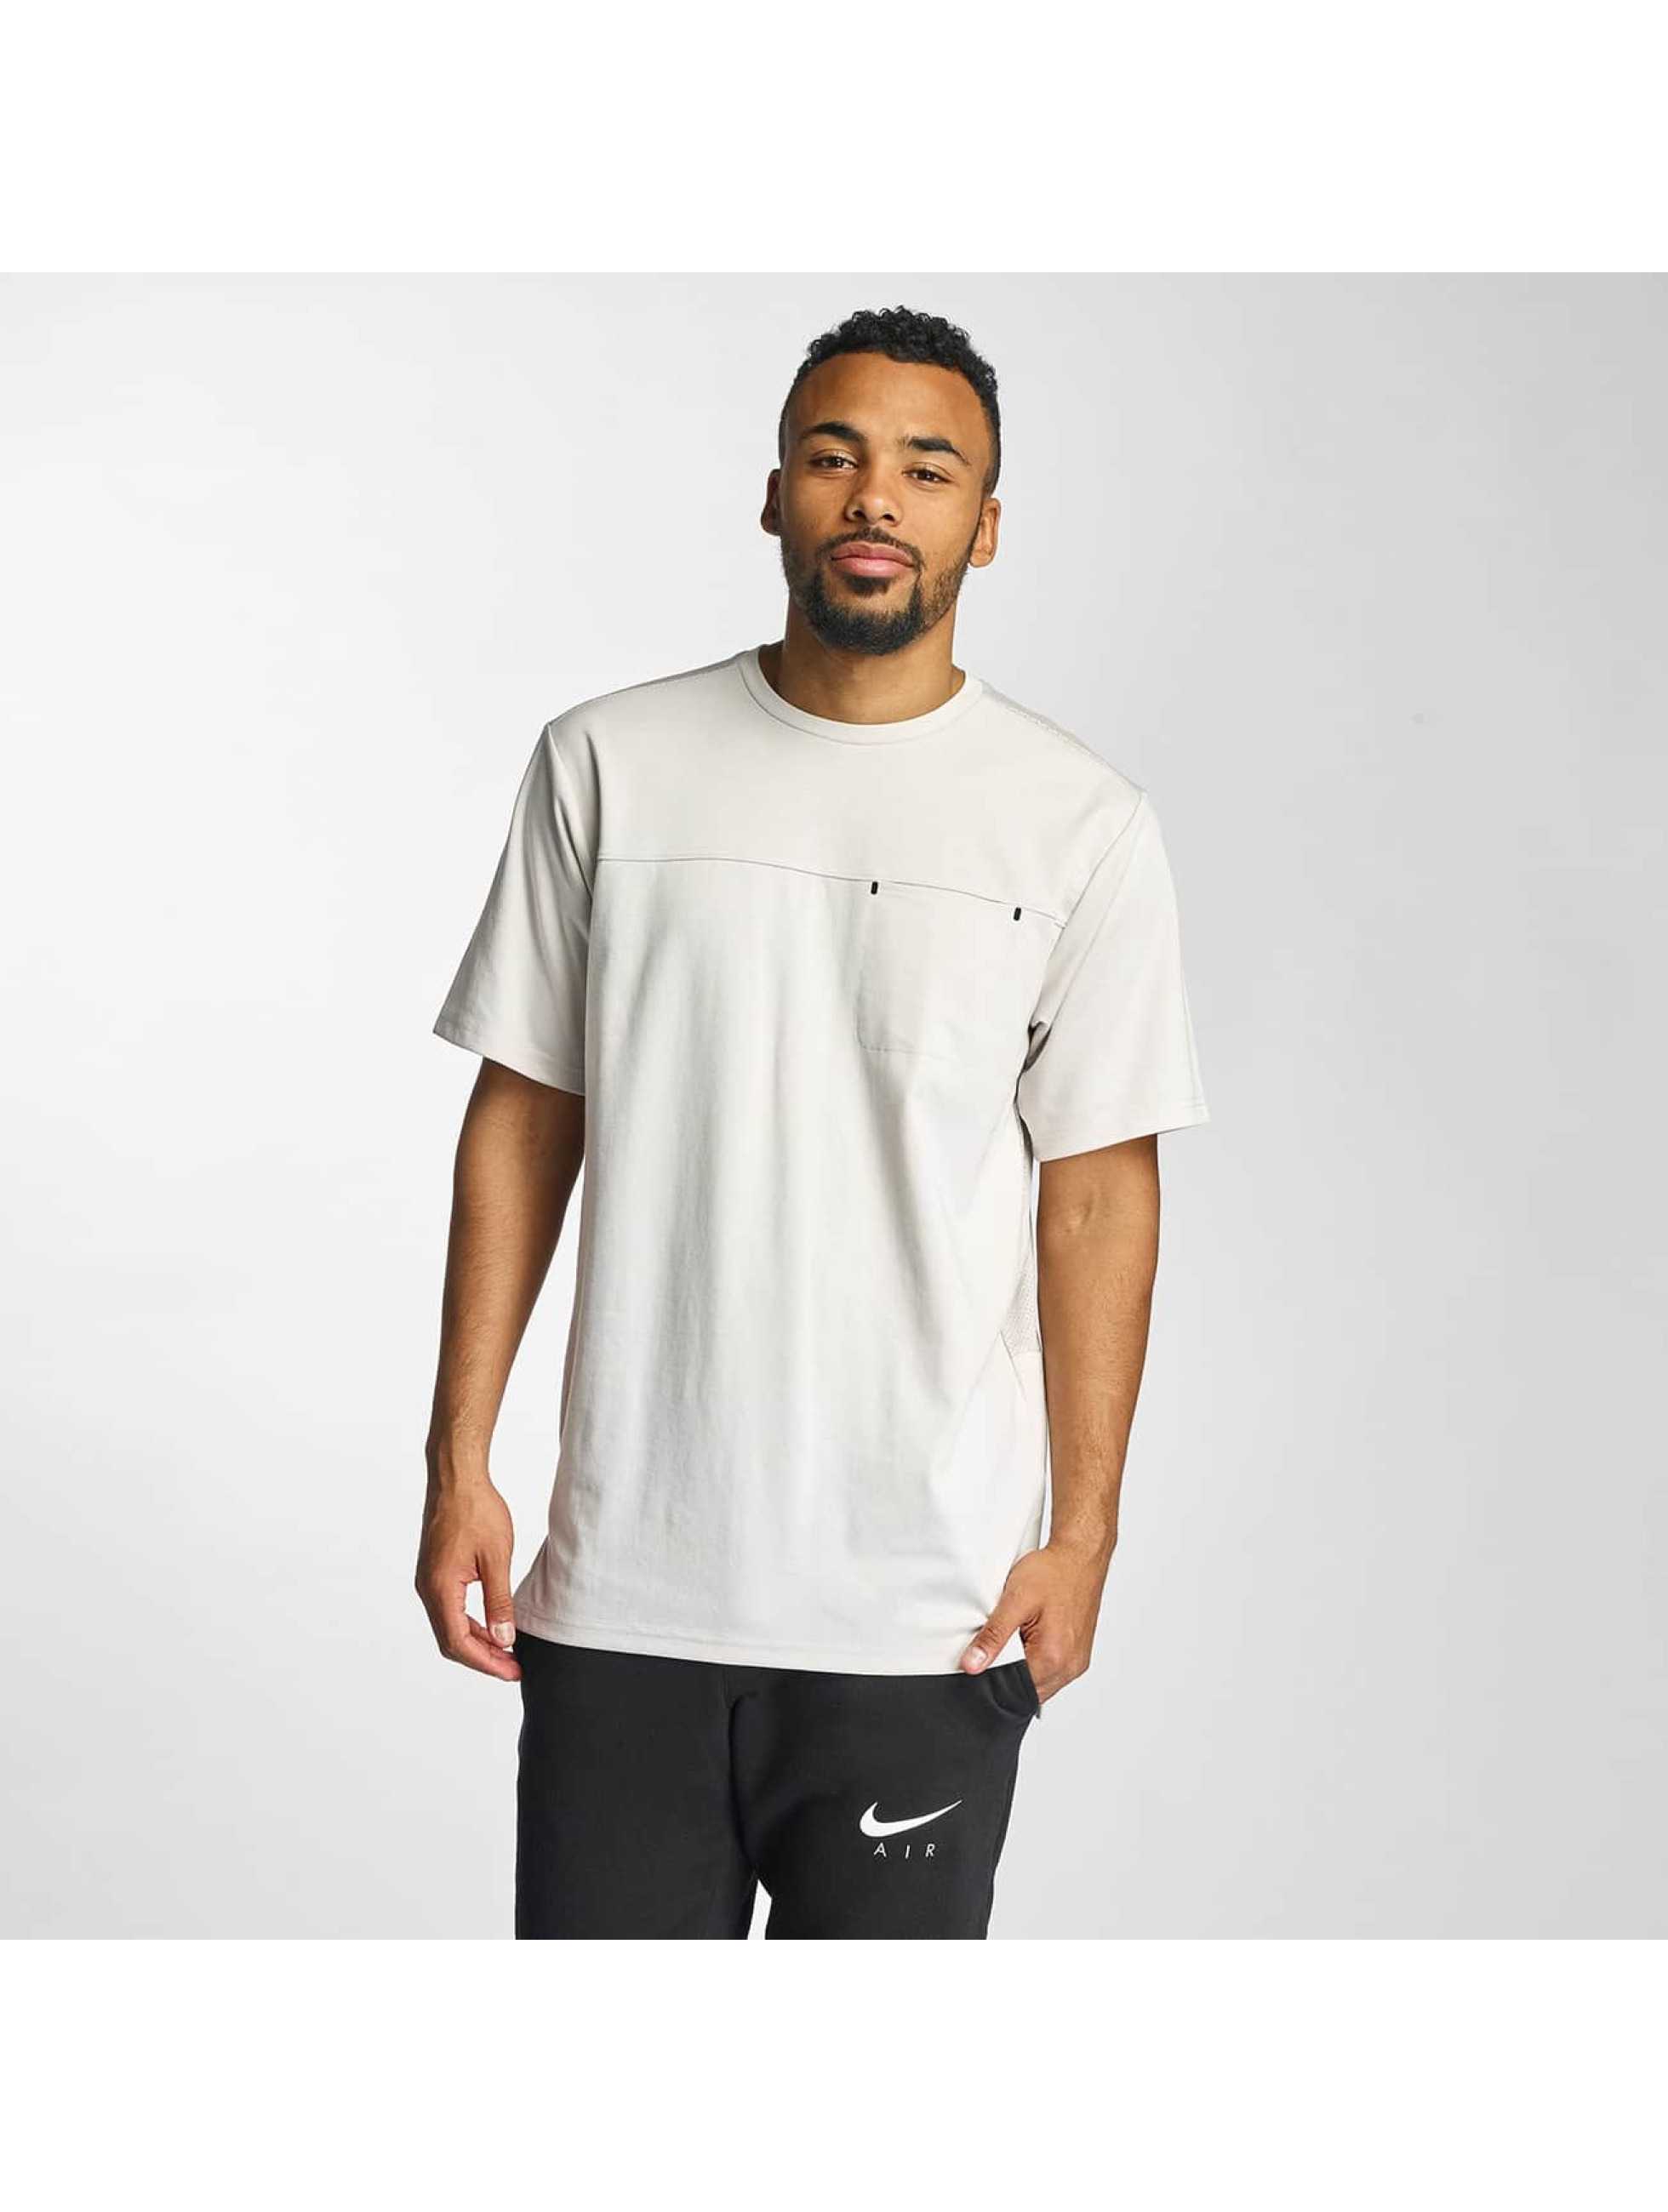 Jordan Männer T-Shirt 23 Lux Classic Pocket in beige